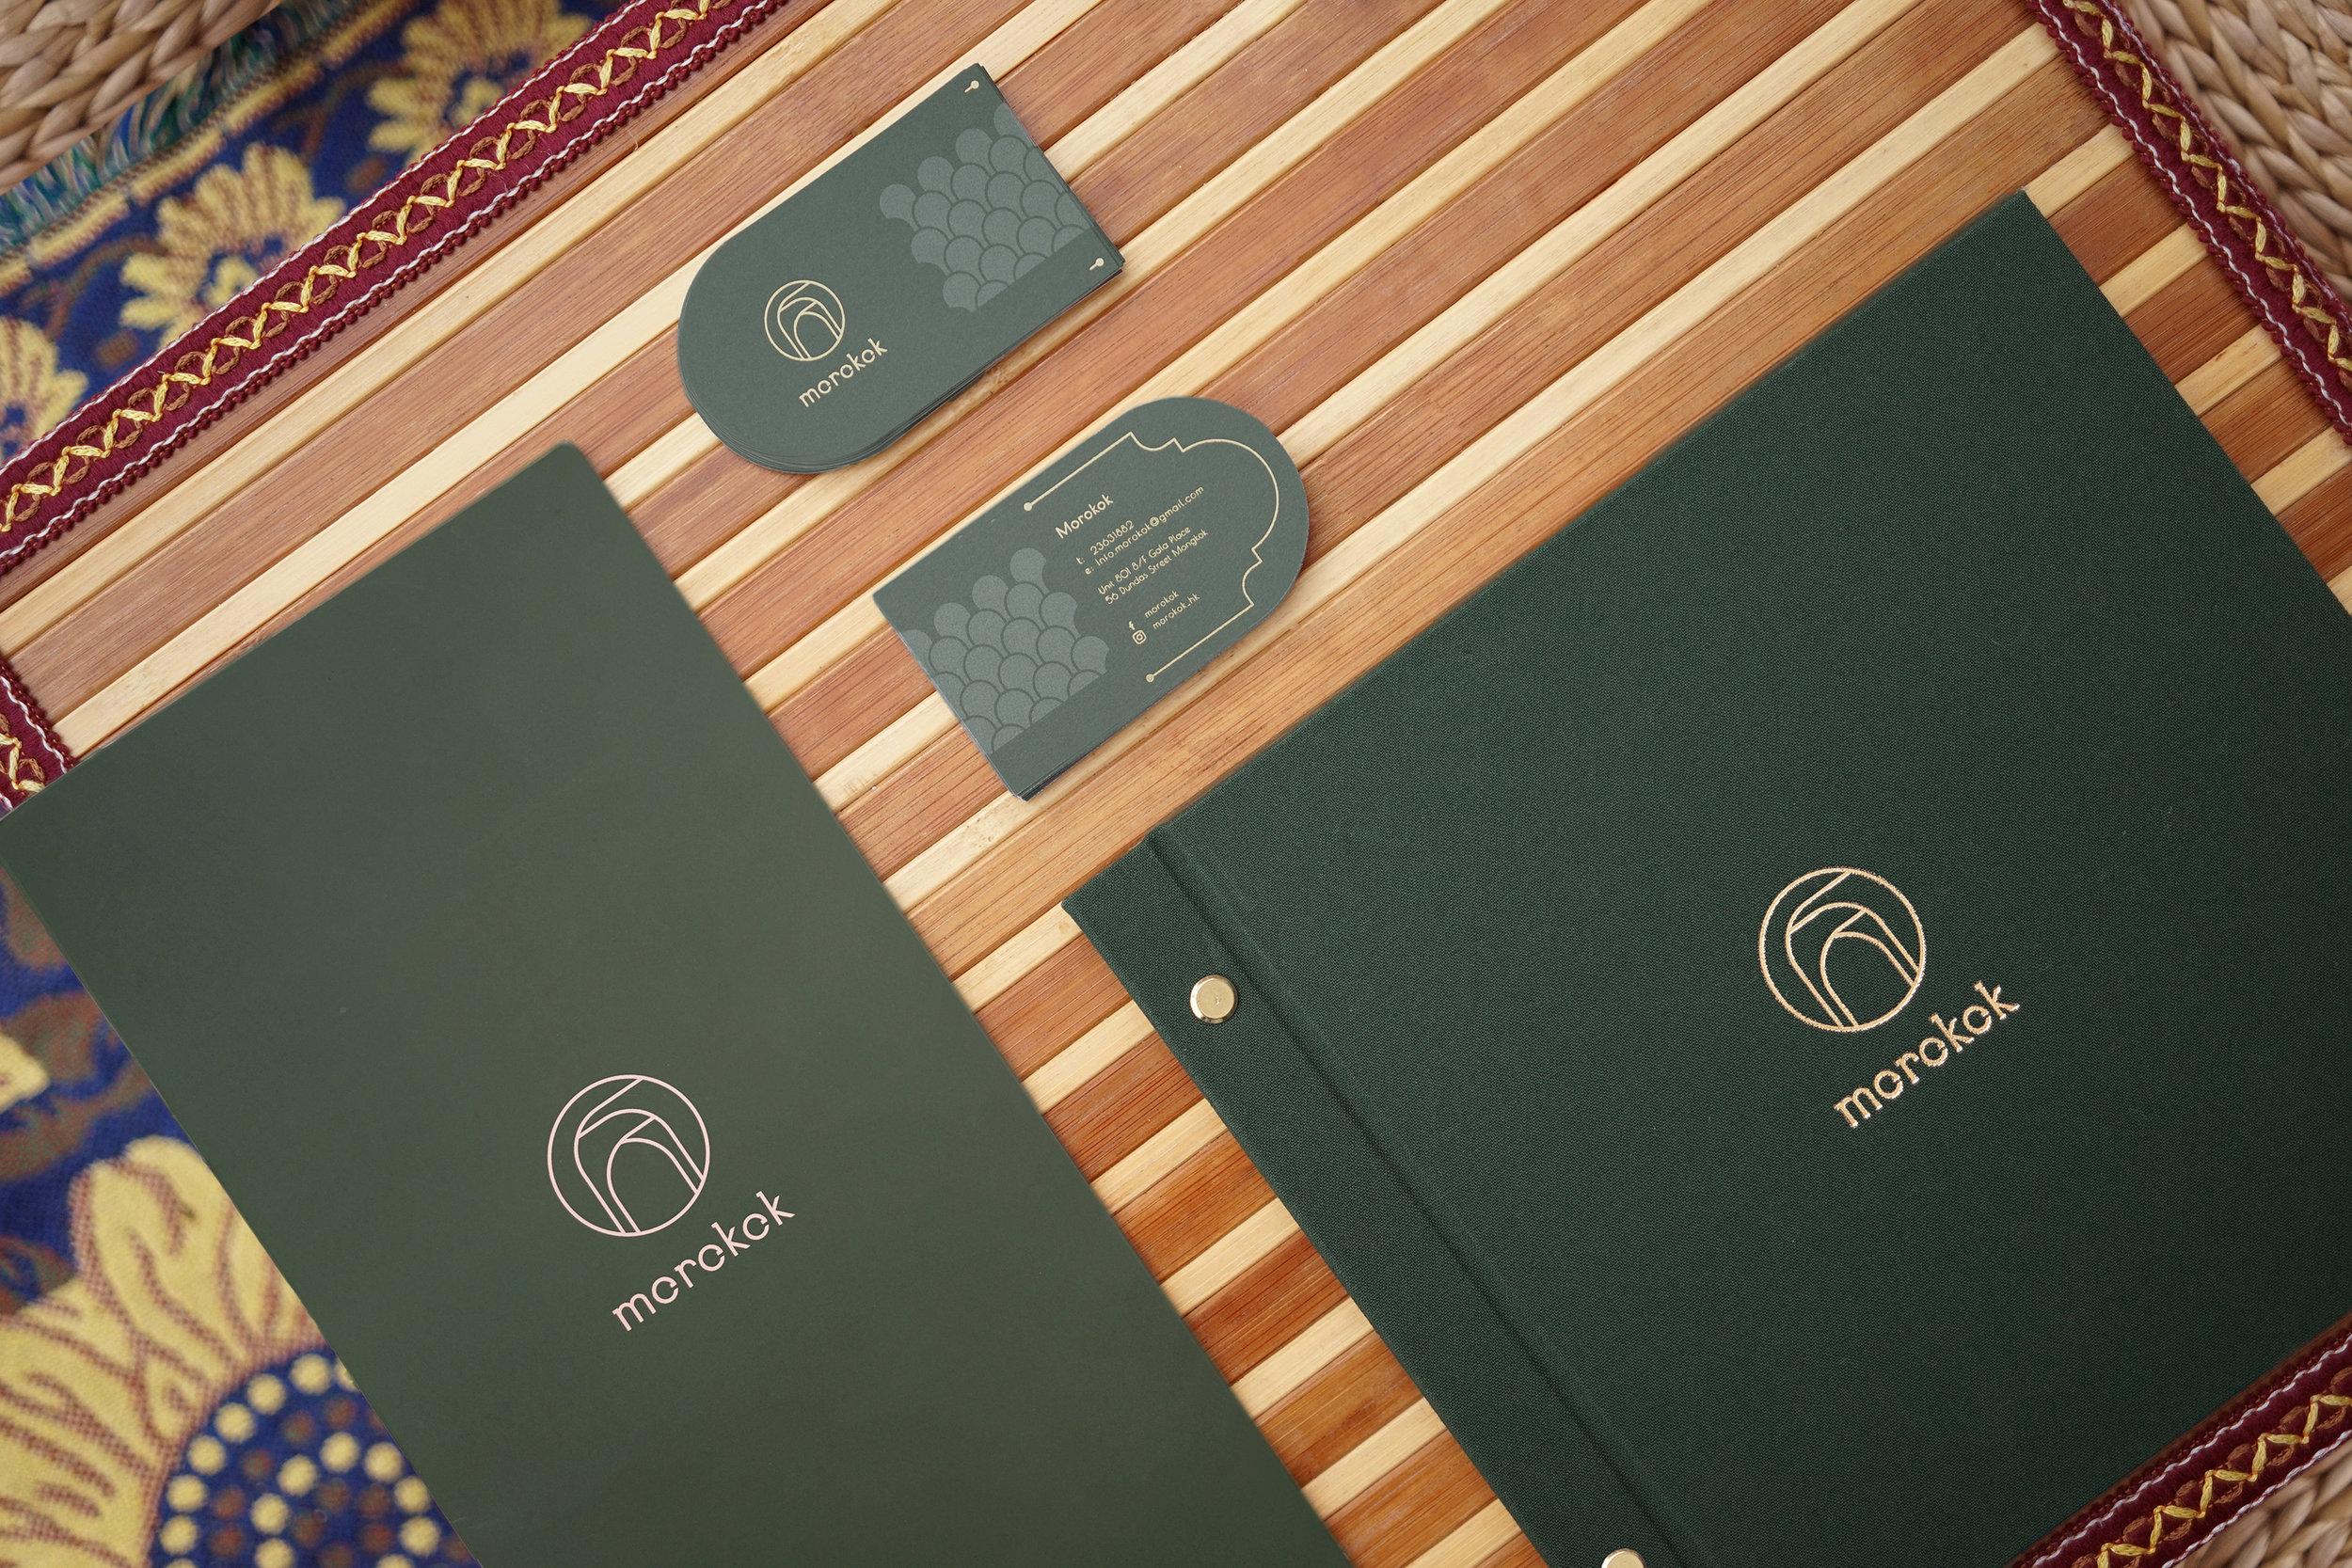 Morokok - Design by: Studio RYTEVisual Division: Corporate Identity DesignWebsite: http://www.studio-ryte.com/projects/morokok